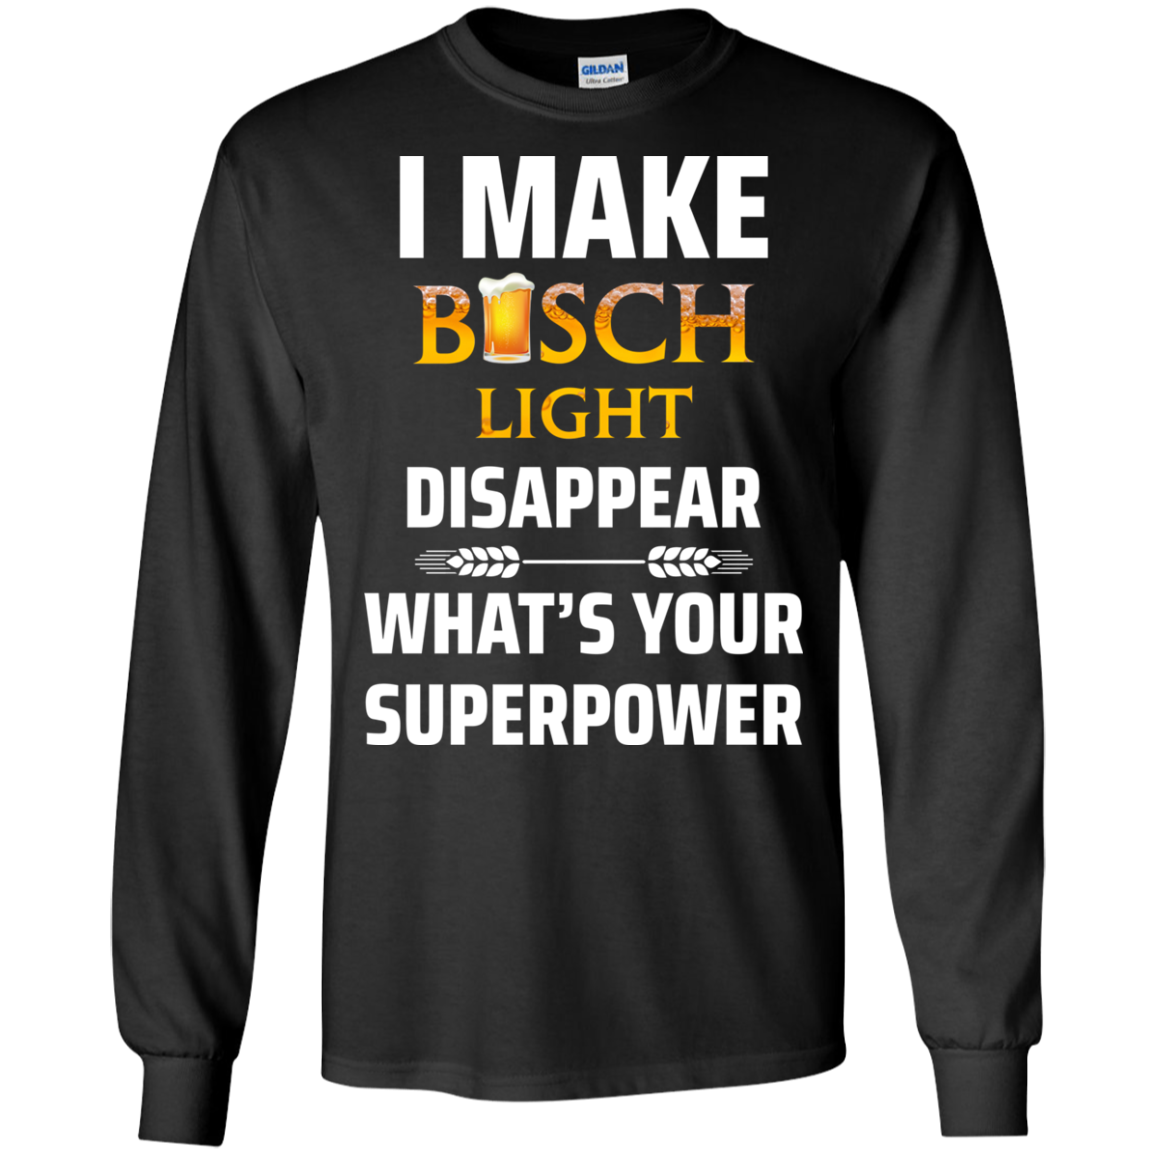 8e939d7098a I Make Busch Light Disappear What s Your Superpower t shirt